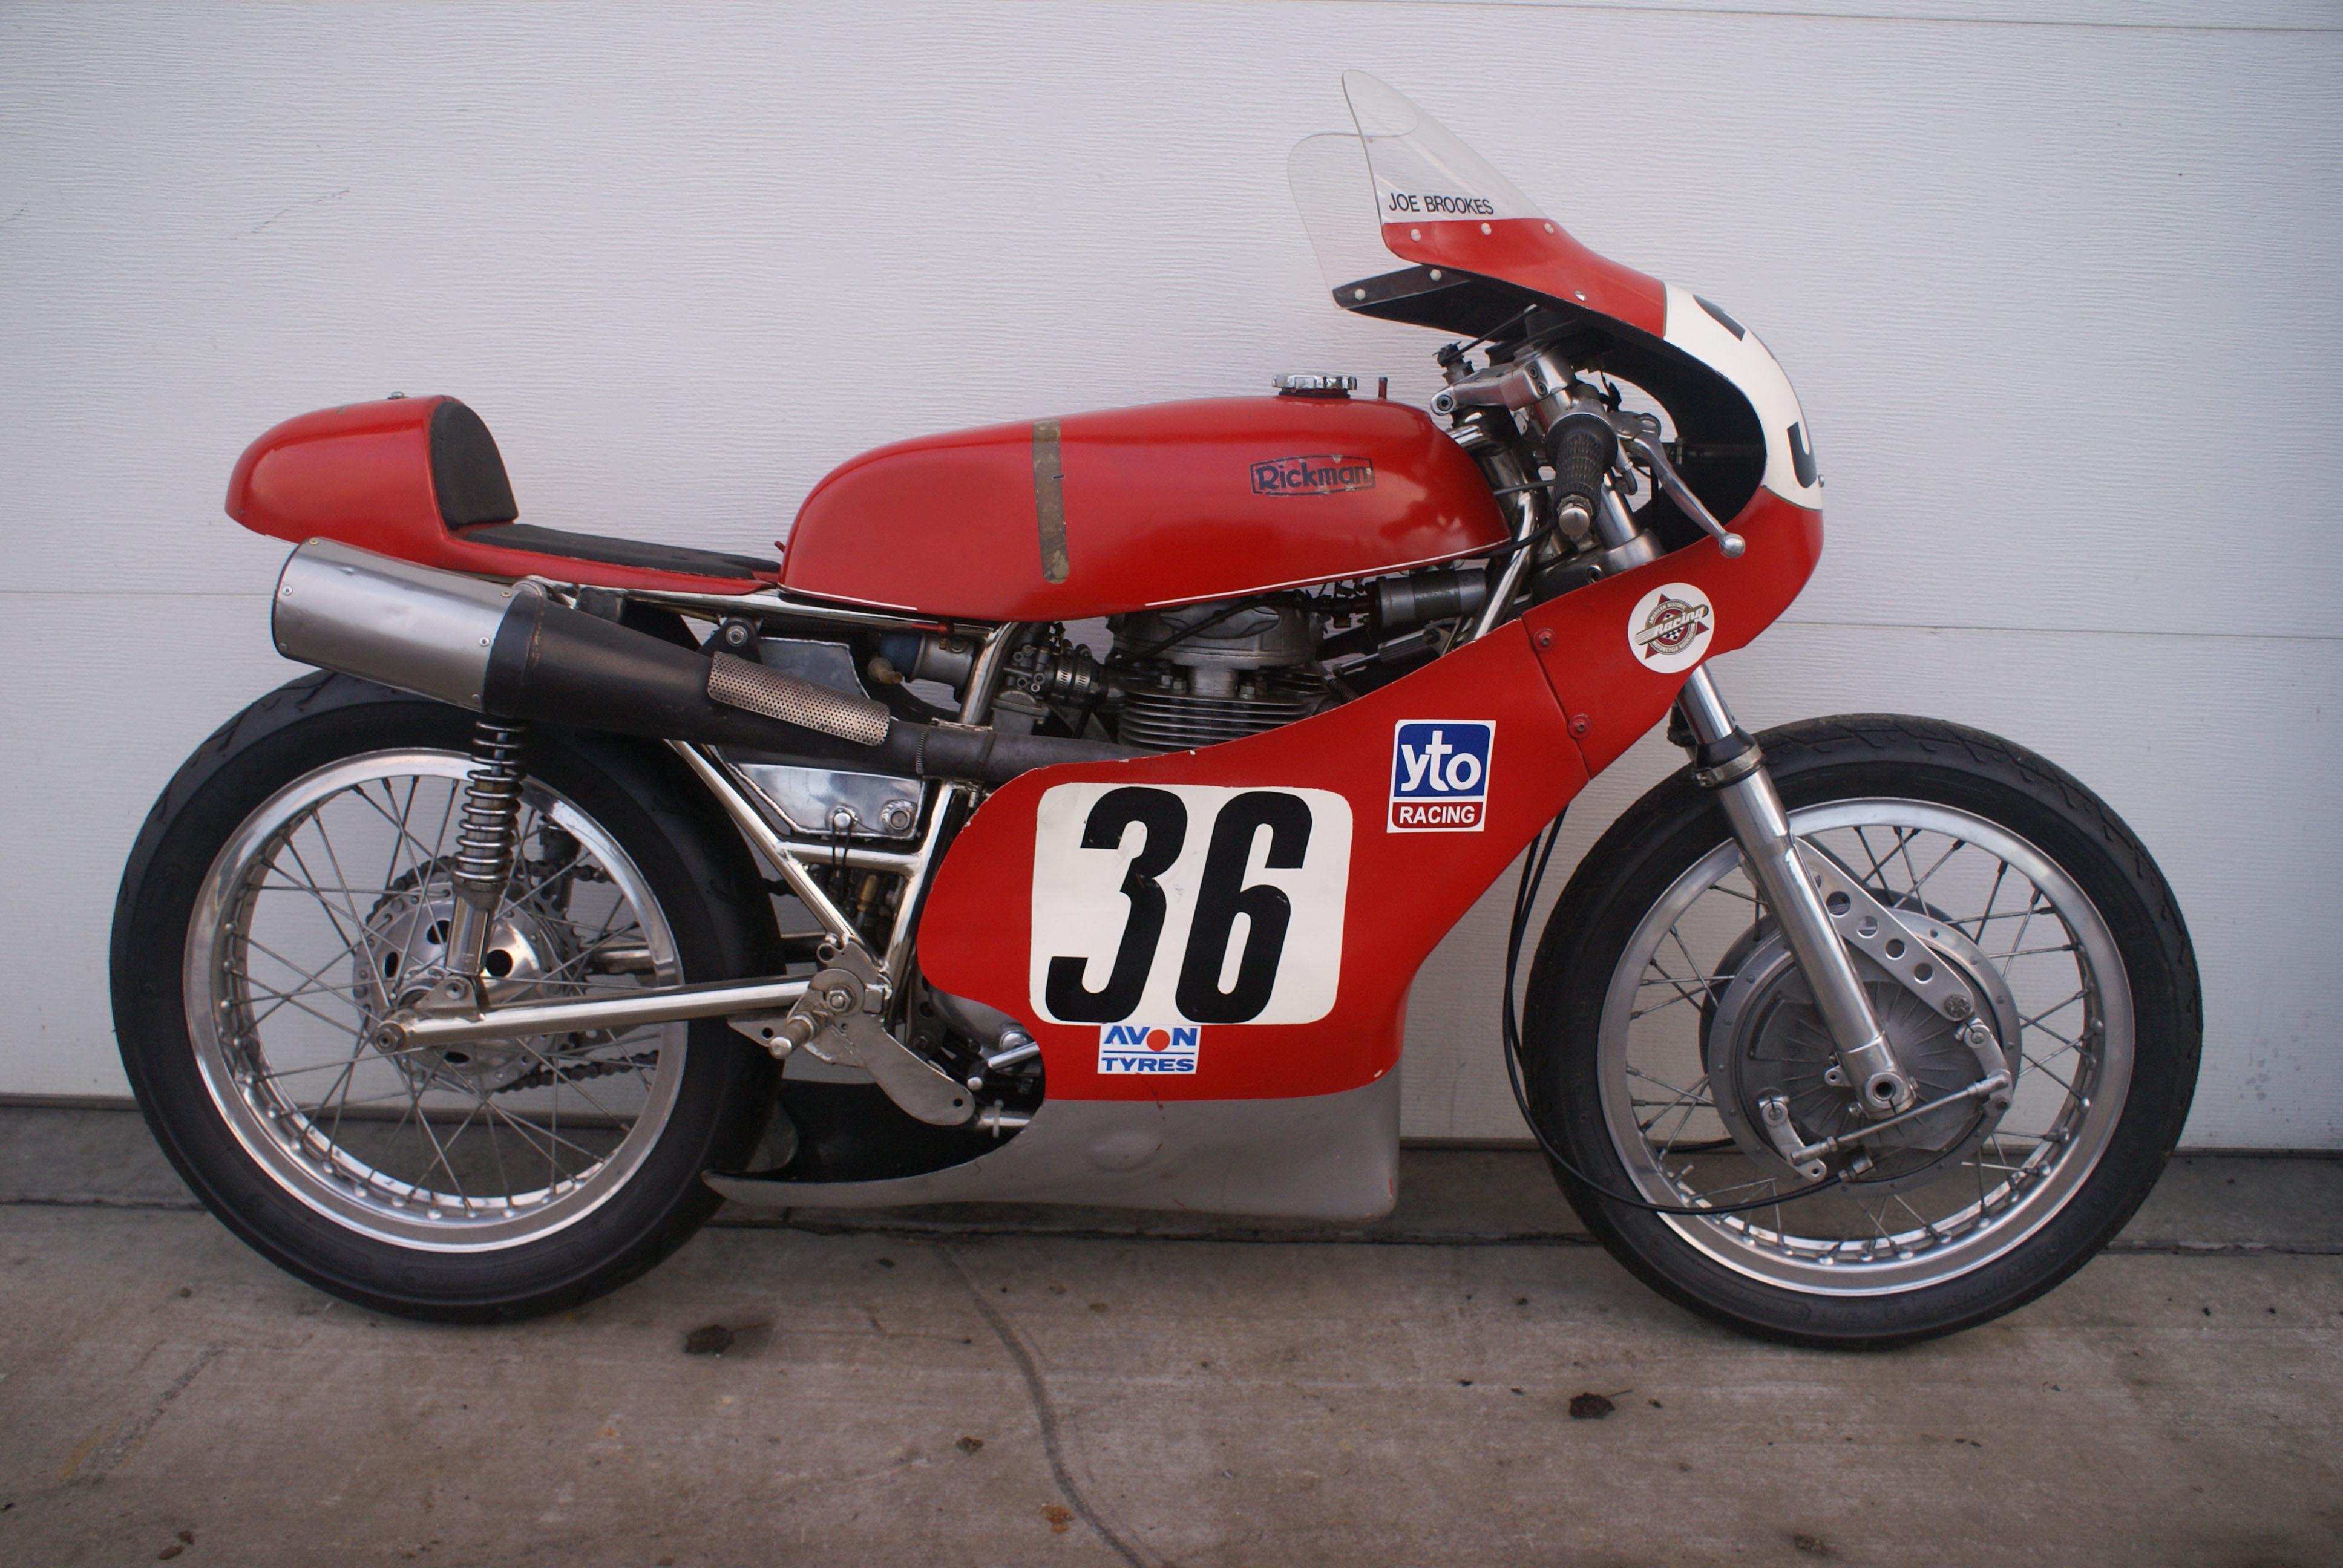 Yamaha Rd 125 Cafe Racer Parts   Newmotorjdi co